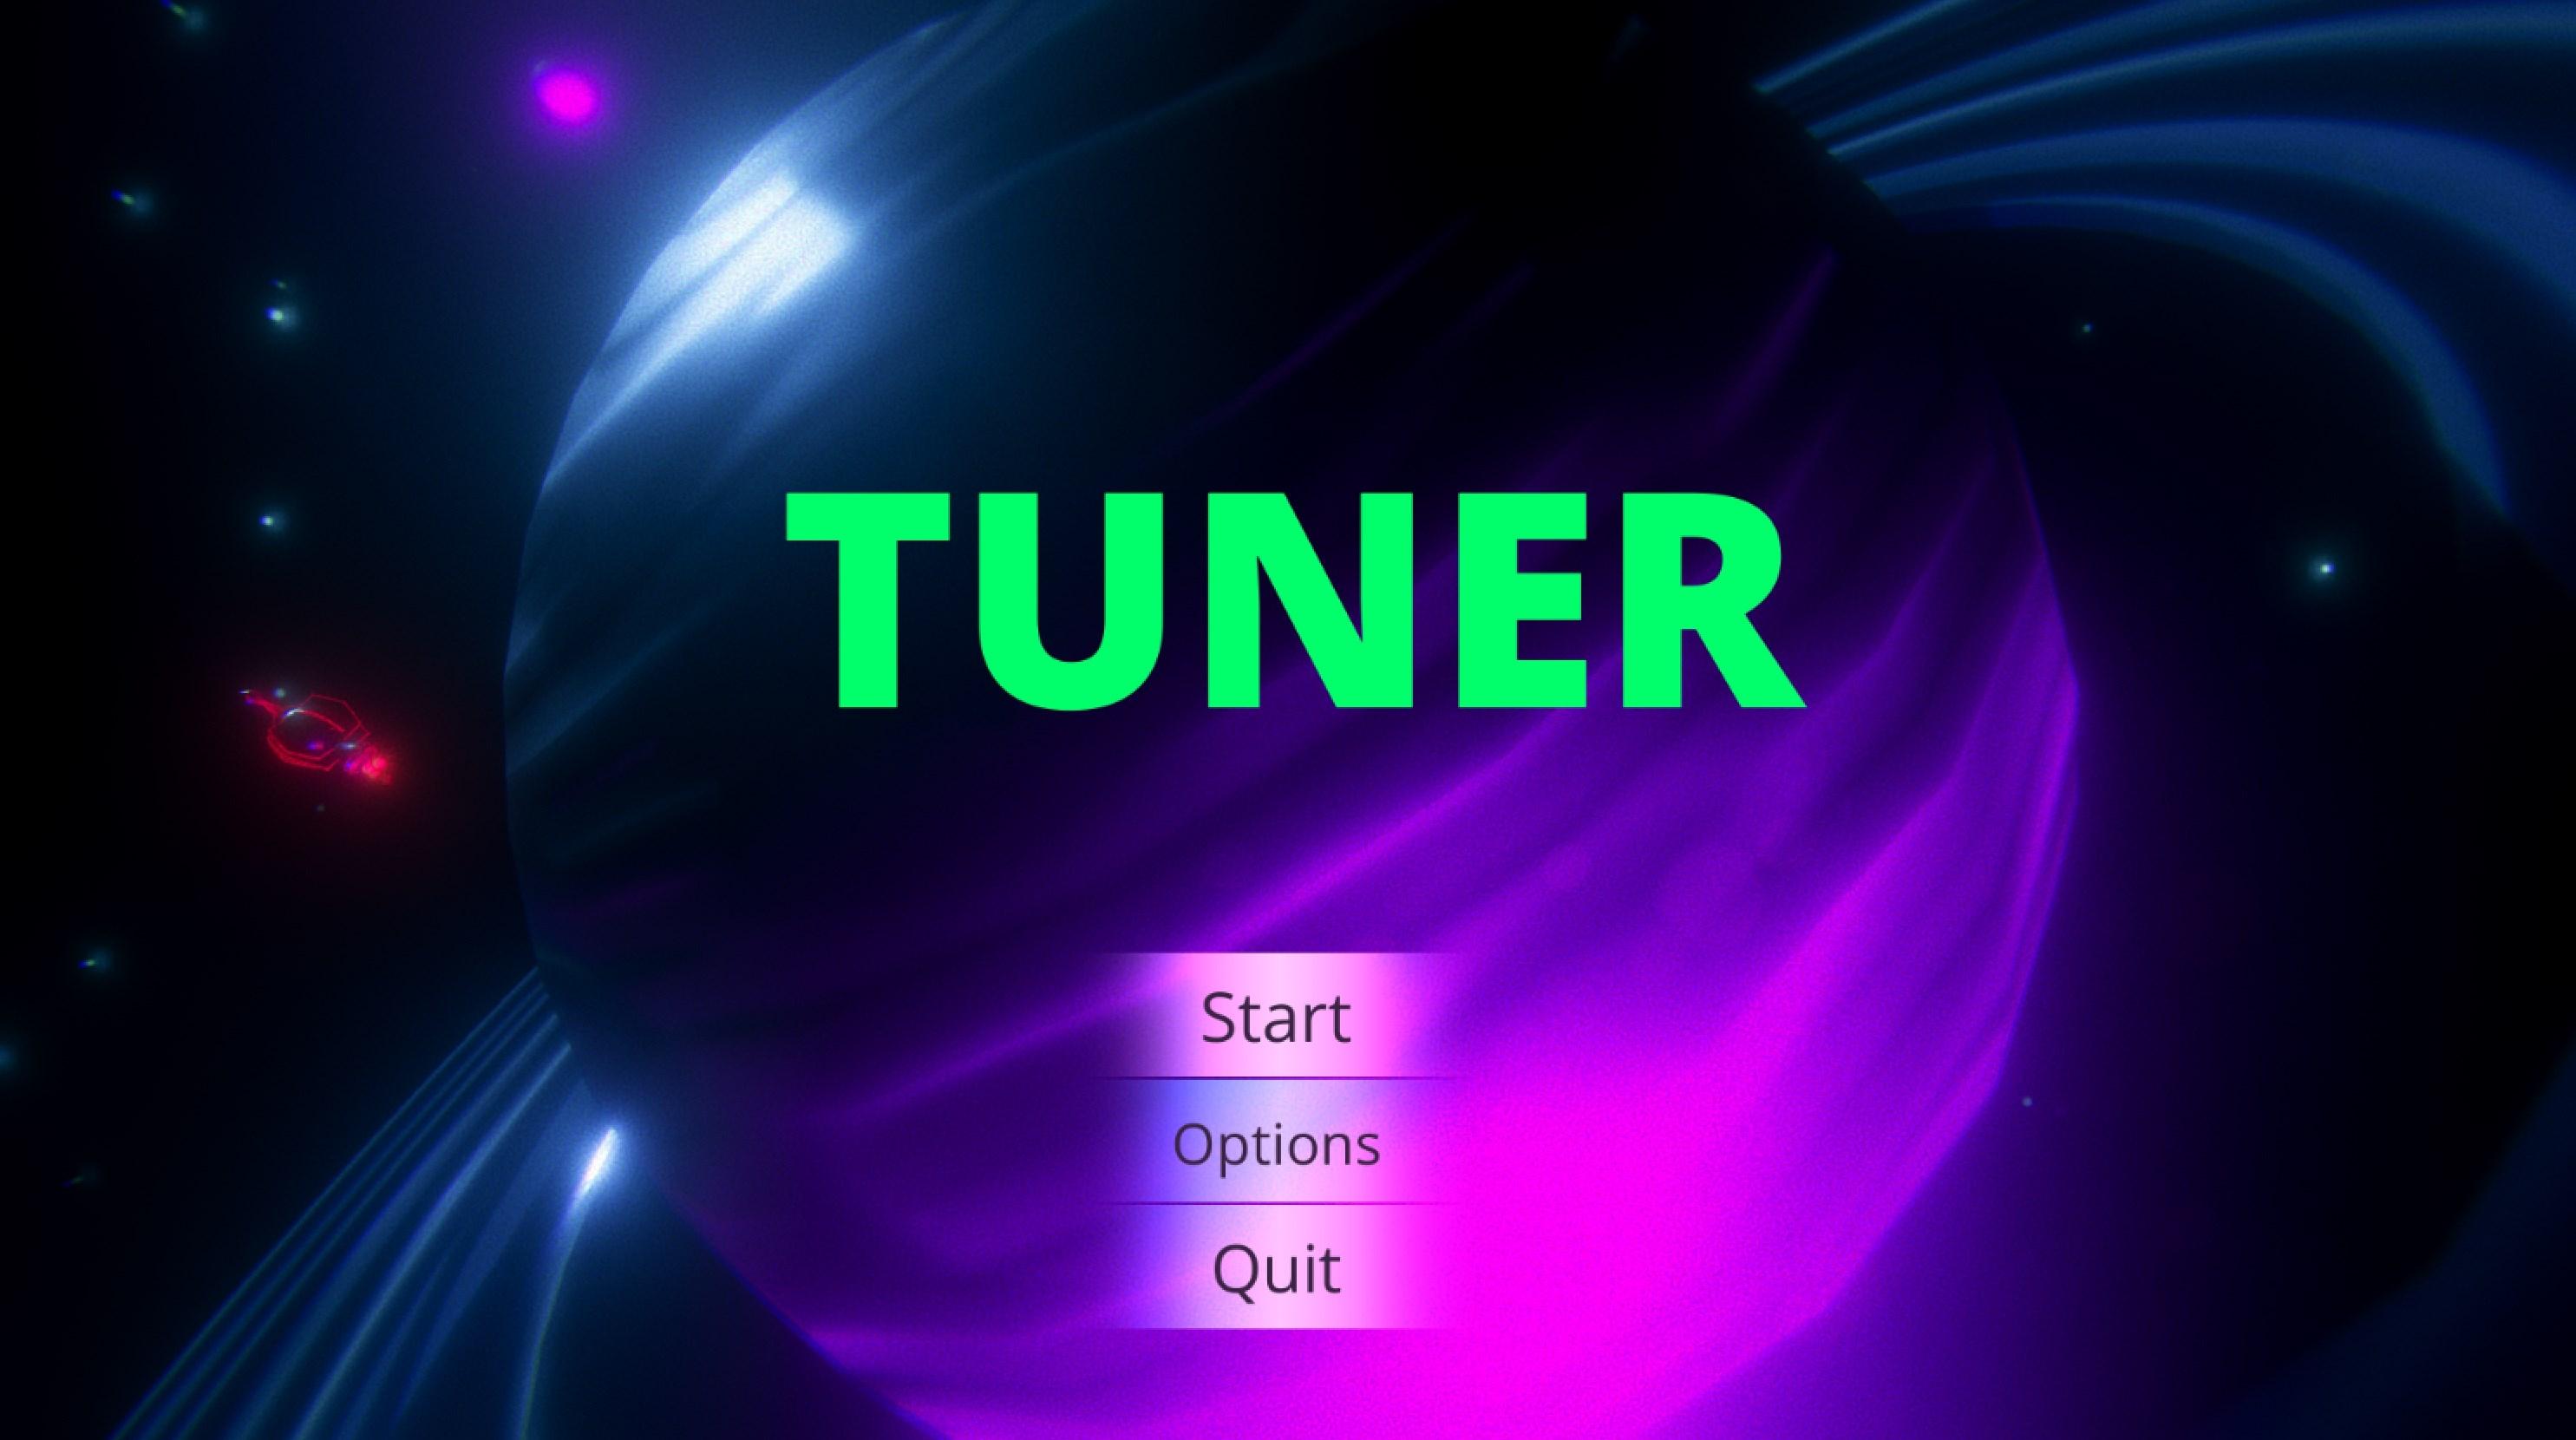 Tuner